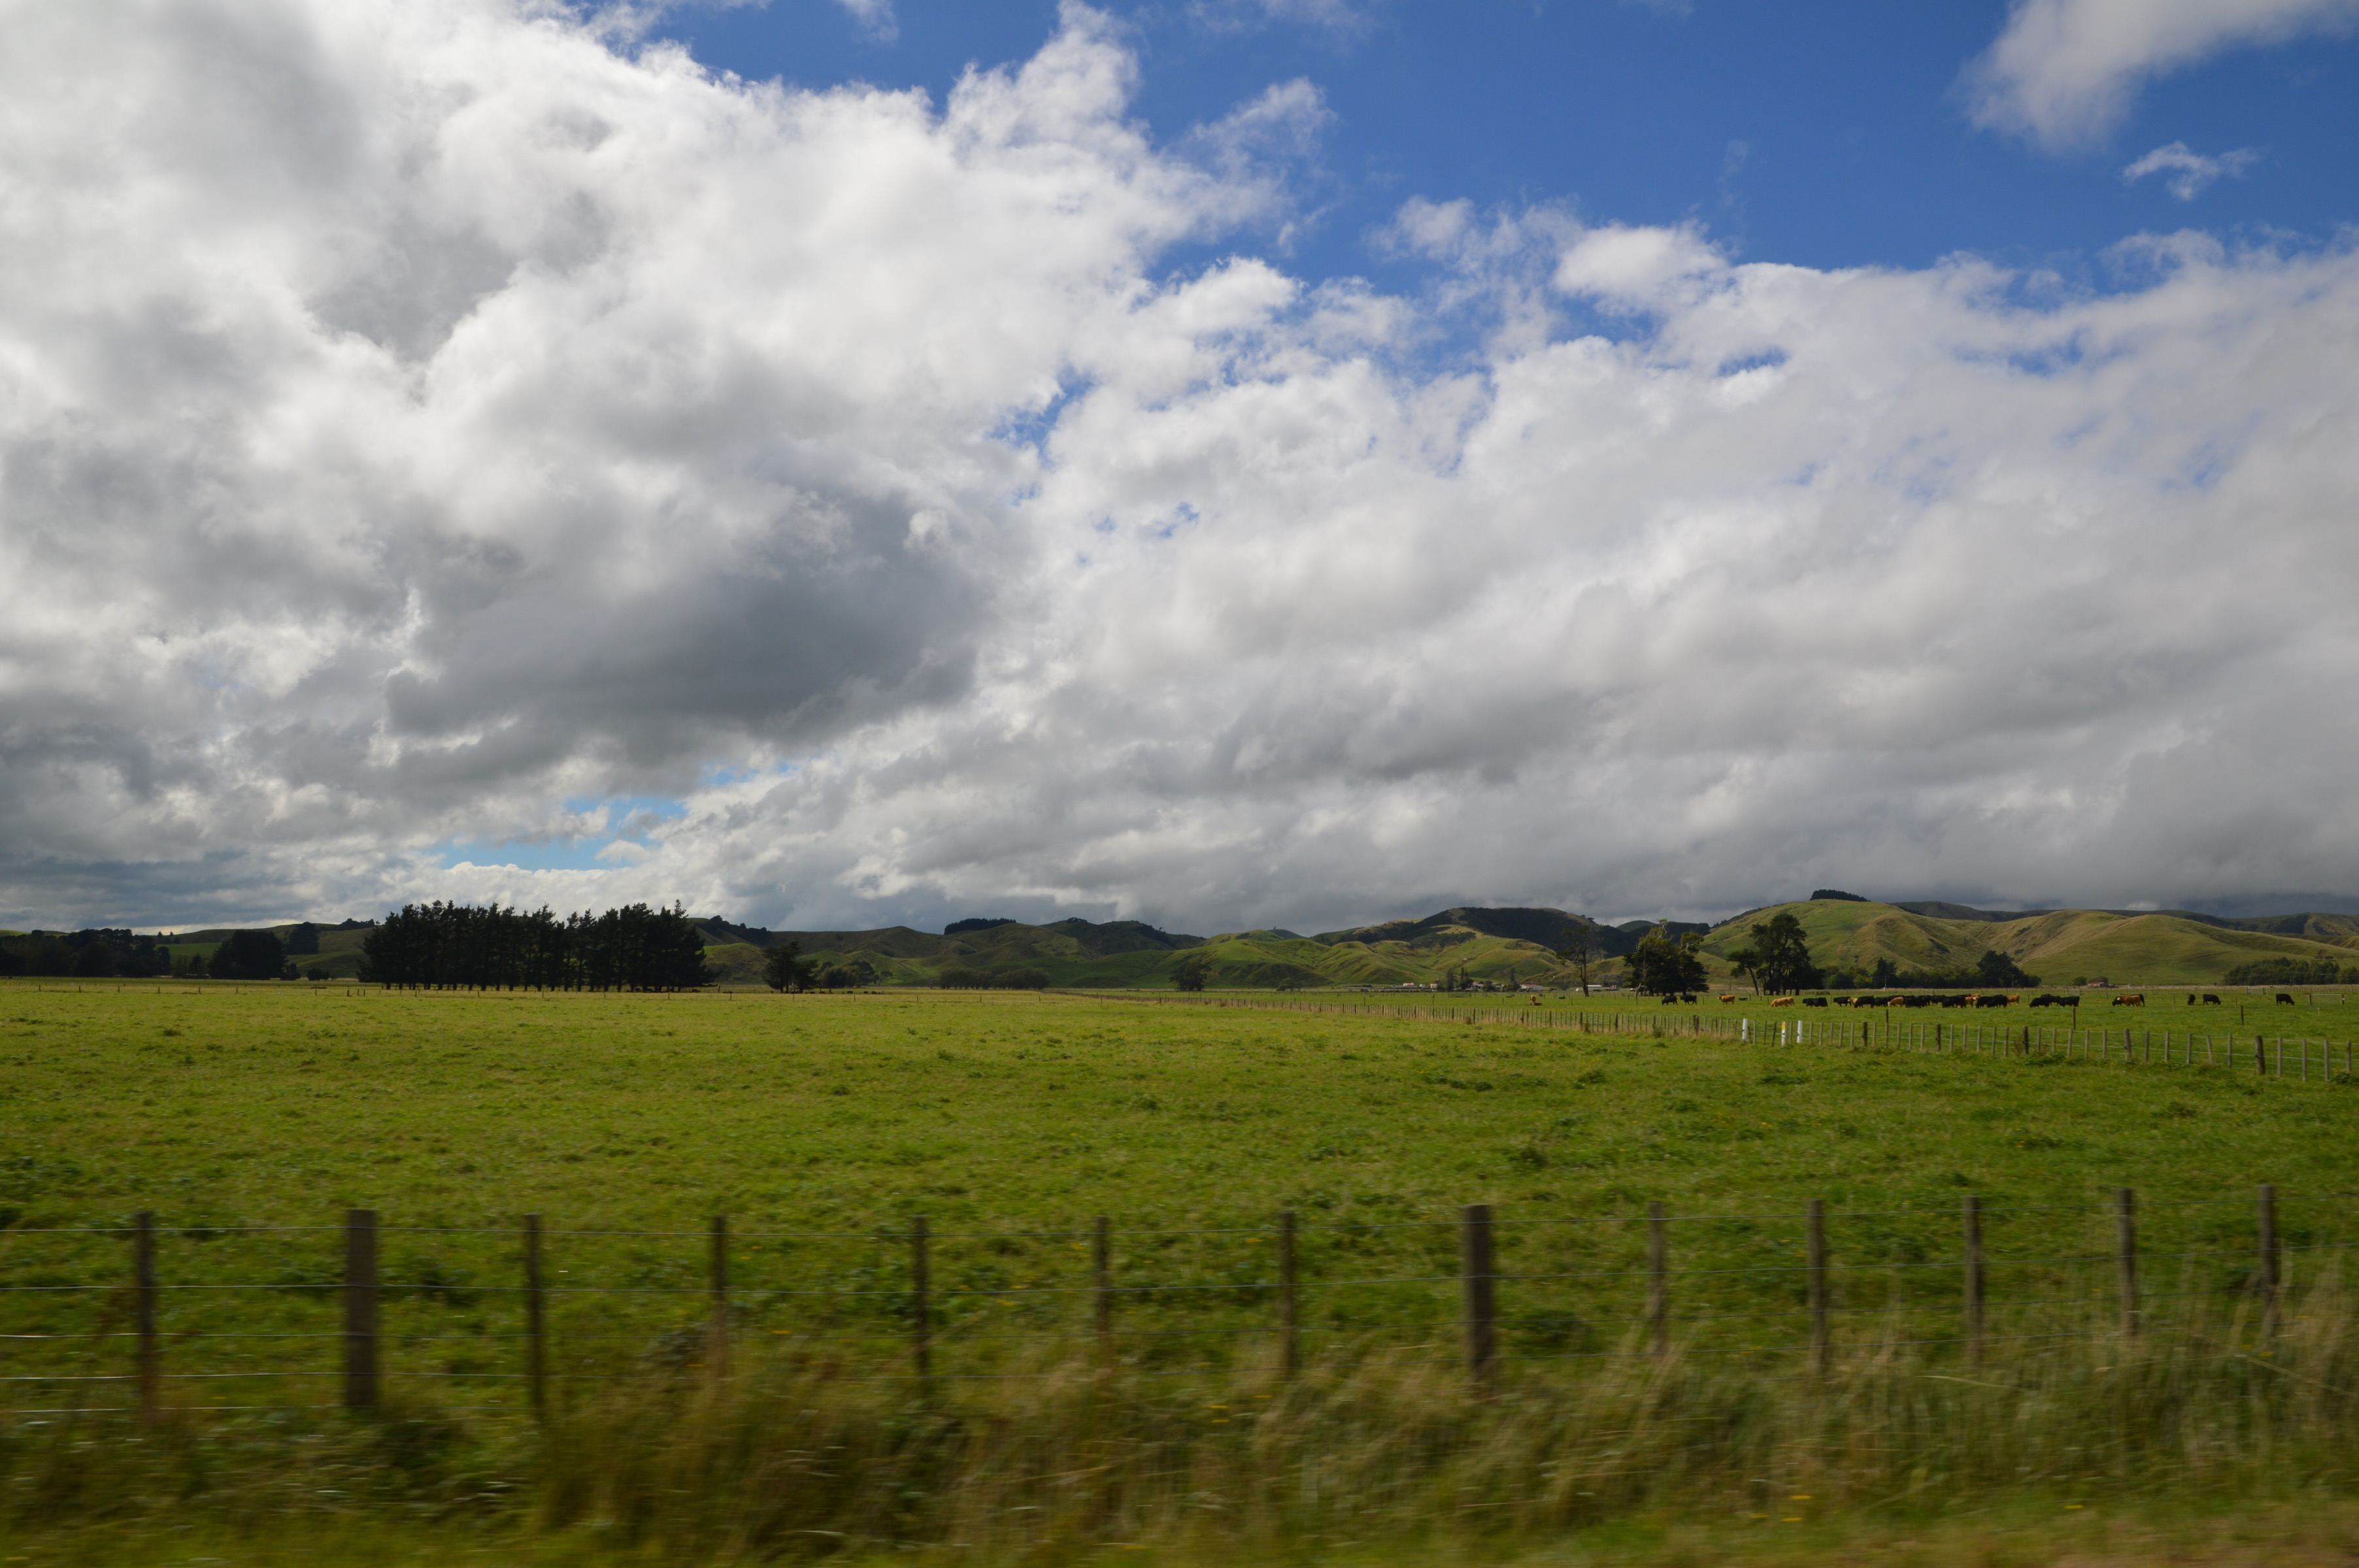 Driving from Taradale to Martinborough, New Zealand